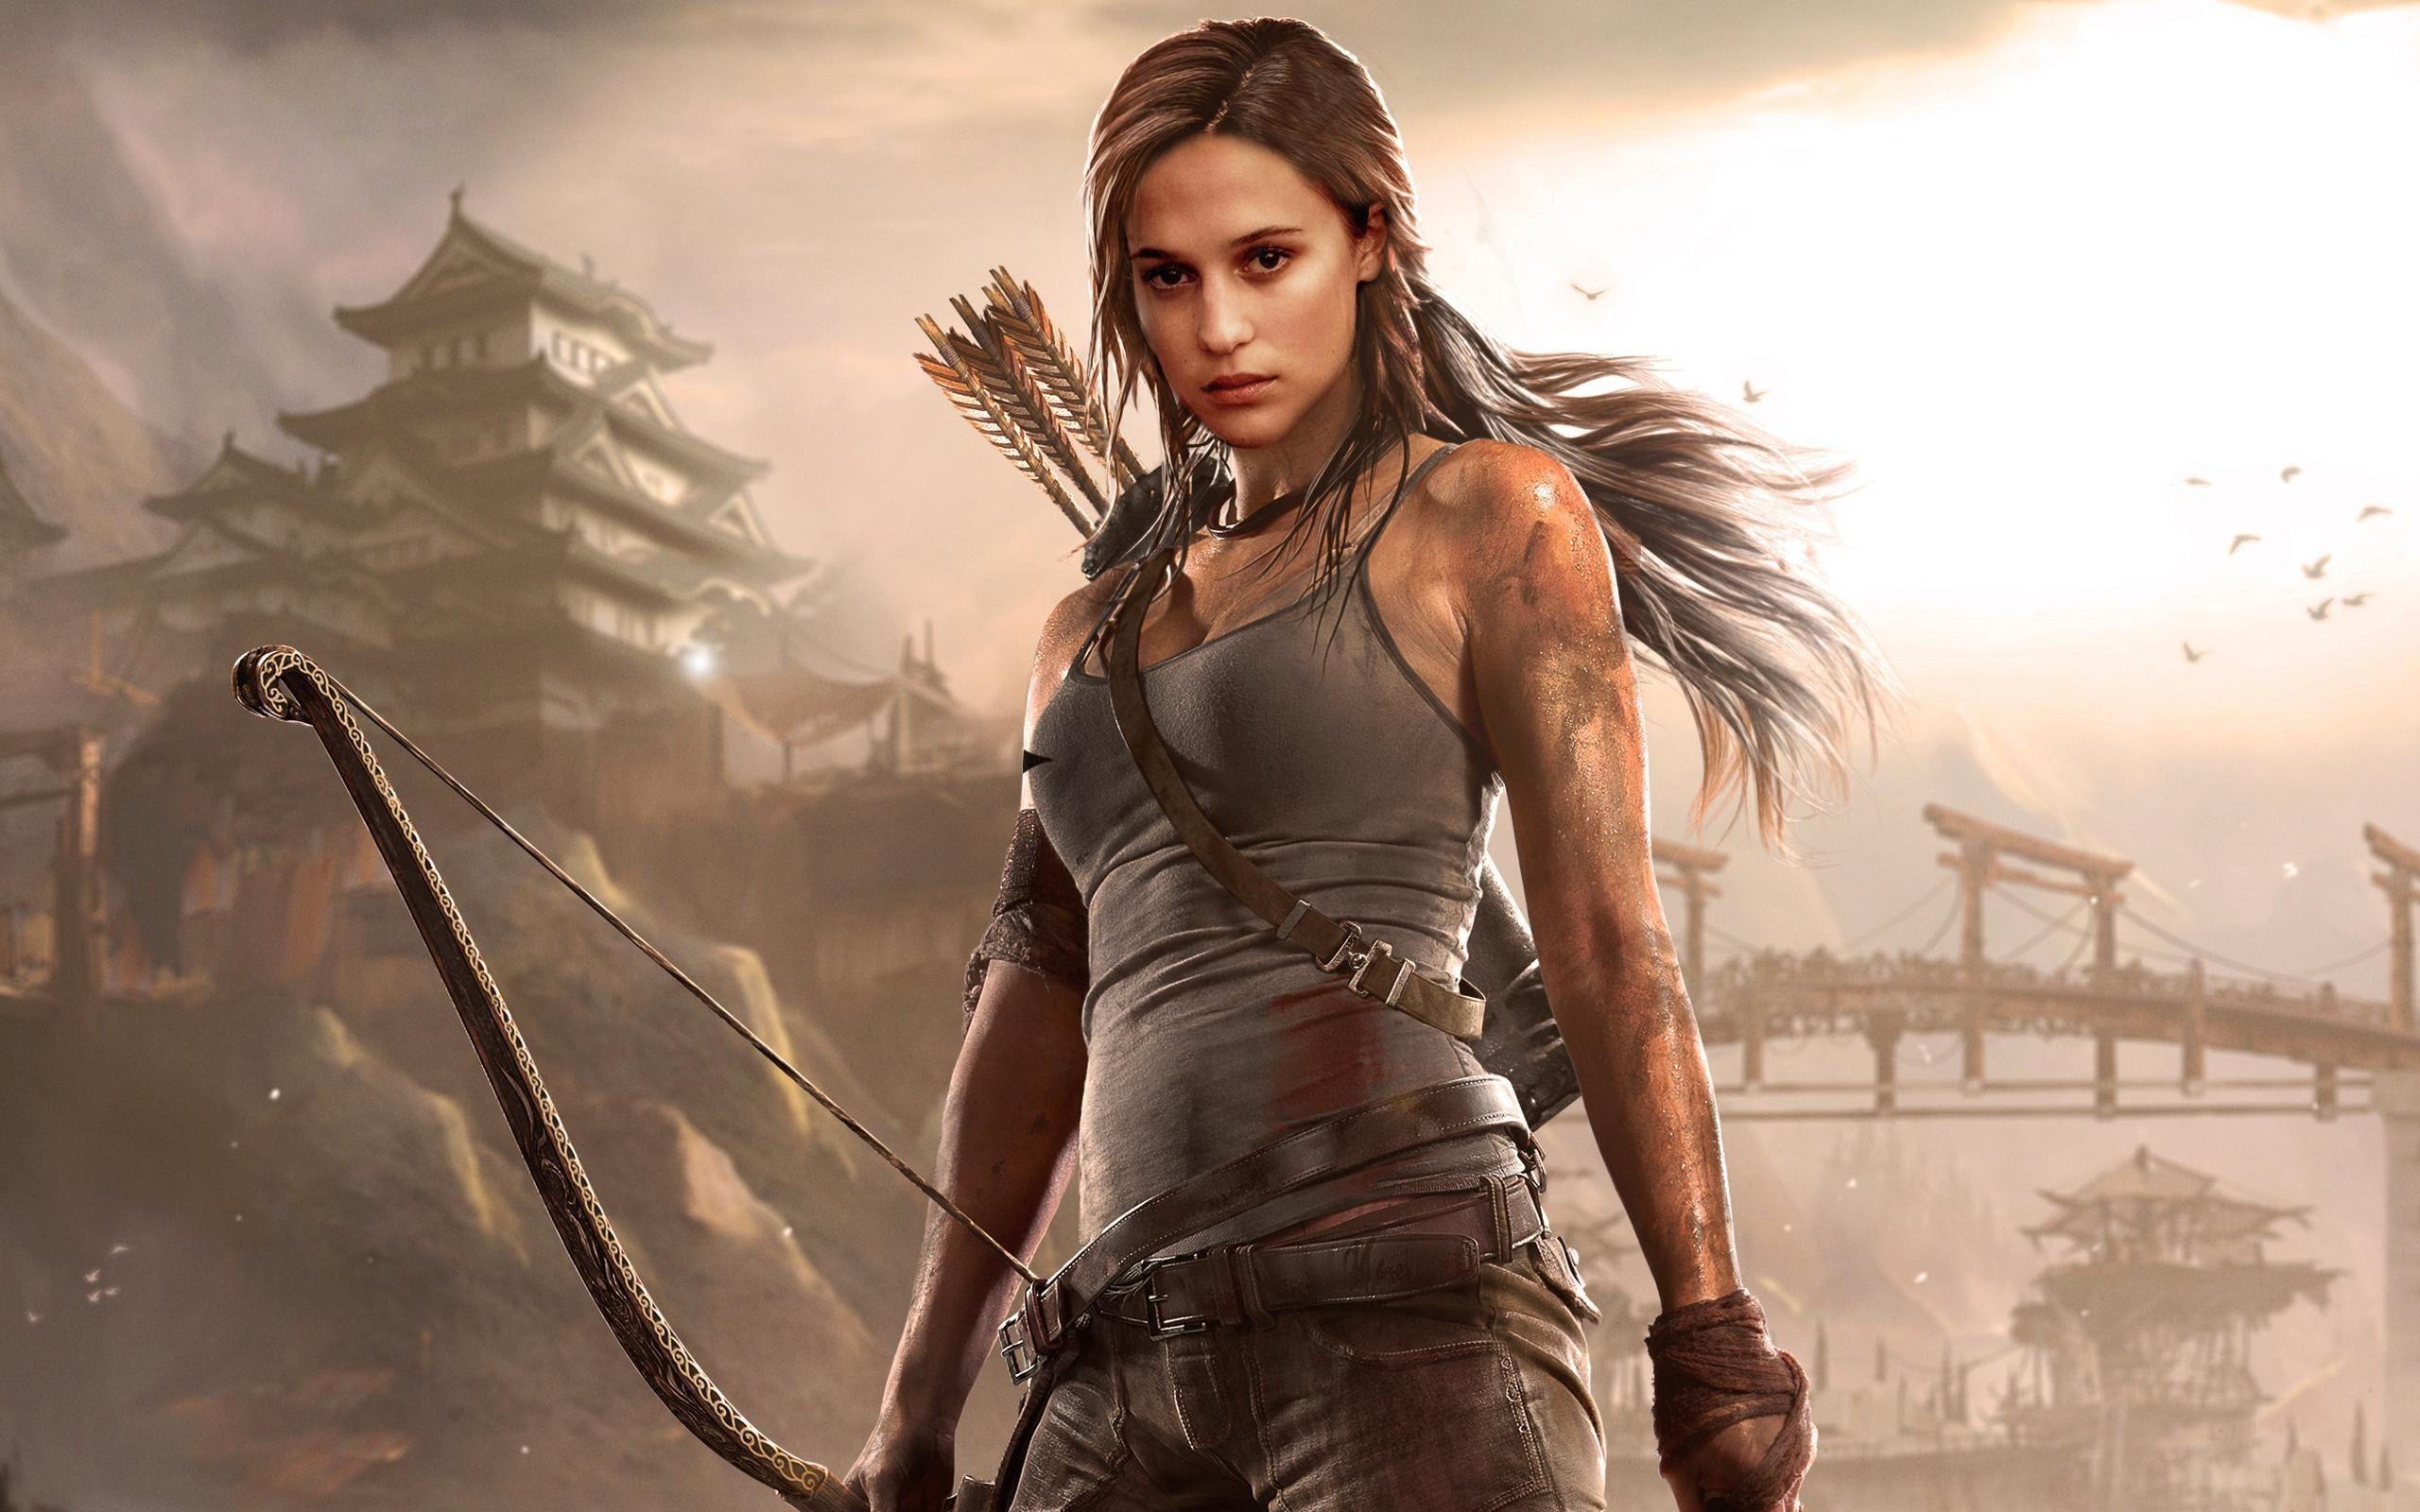 Tomb Raider 2018 Hd Wallpaper 76 Images